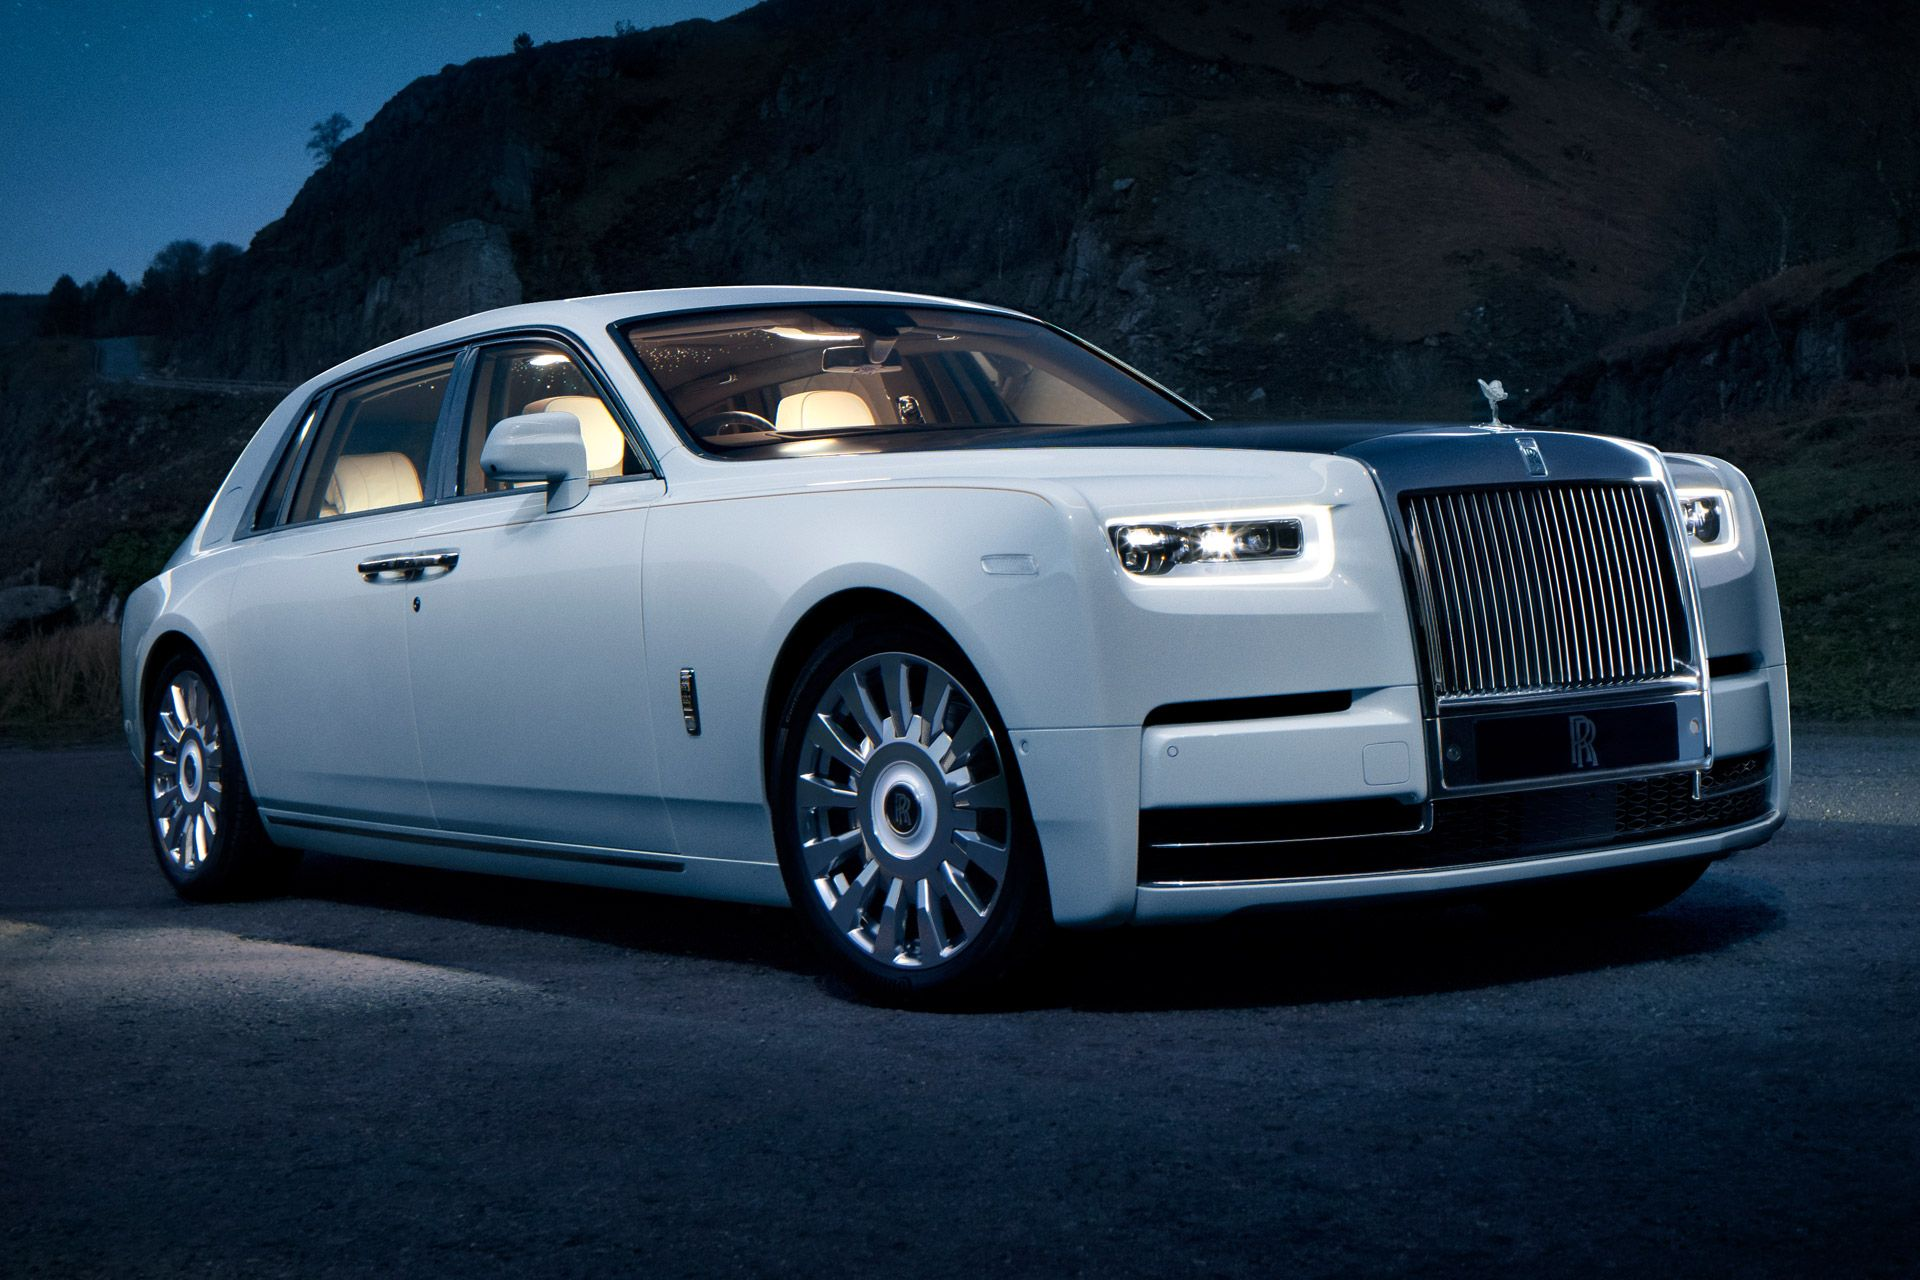 2019 Rolls Royce Phantom Tranquillity Sedan Rolls Royce Phantom Luxury Cars Rolls Royce Rolls Royce